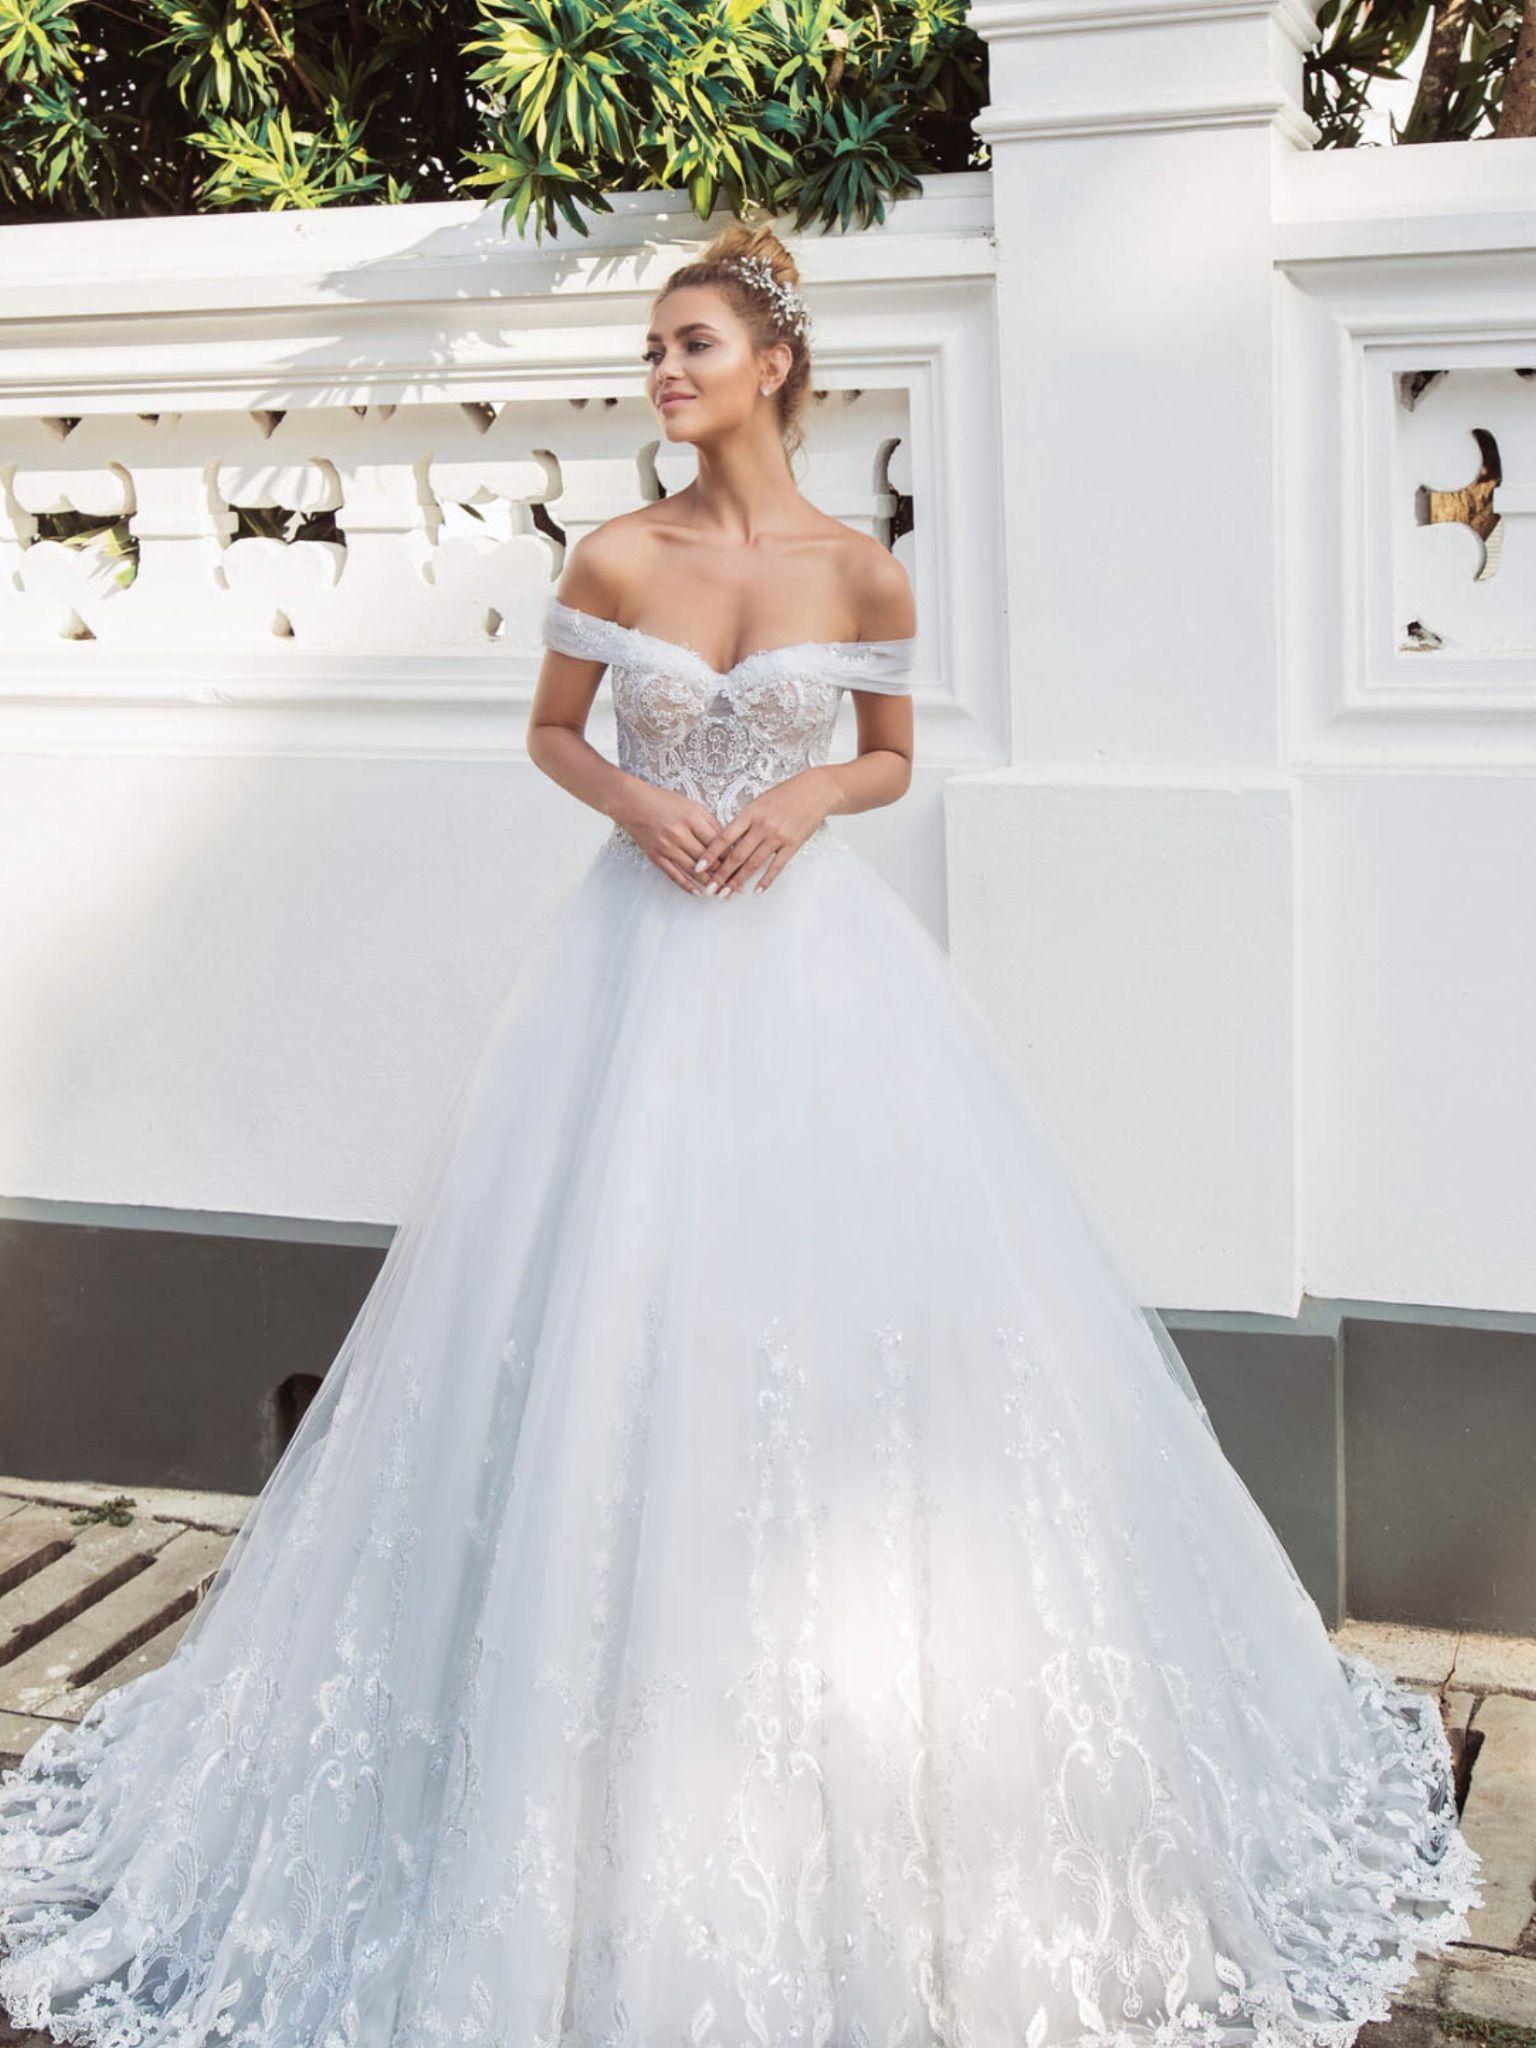 6bdb3d40c842 Νυφικα 2019  ρομαντικα νυφικα  νυφικα με εντυπωσιακη πλατη  γοργονε νυφικα   νυφικα με